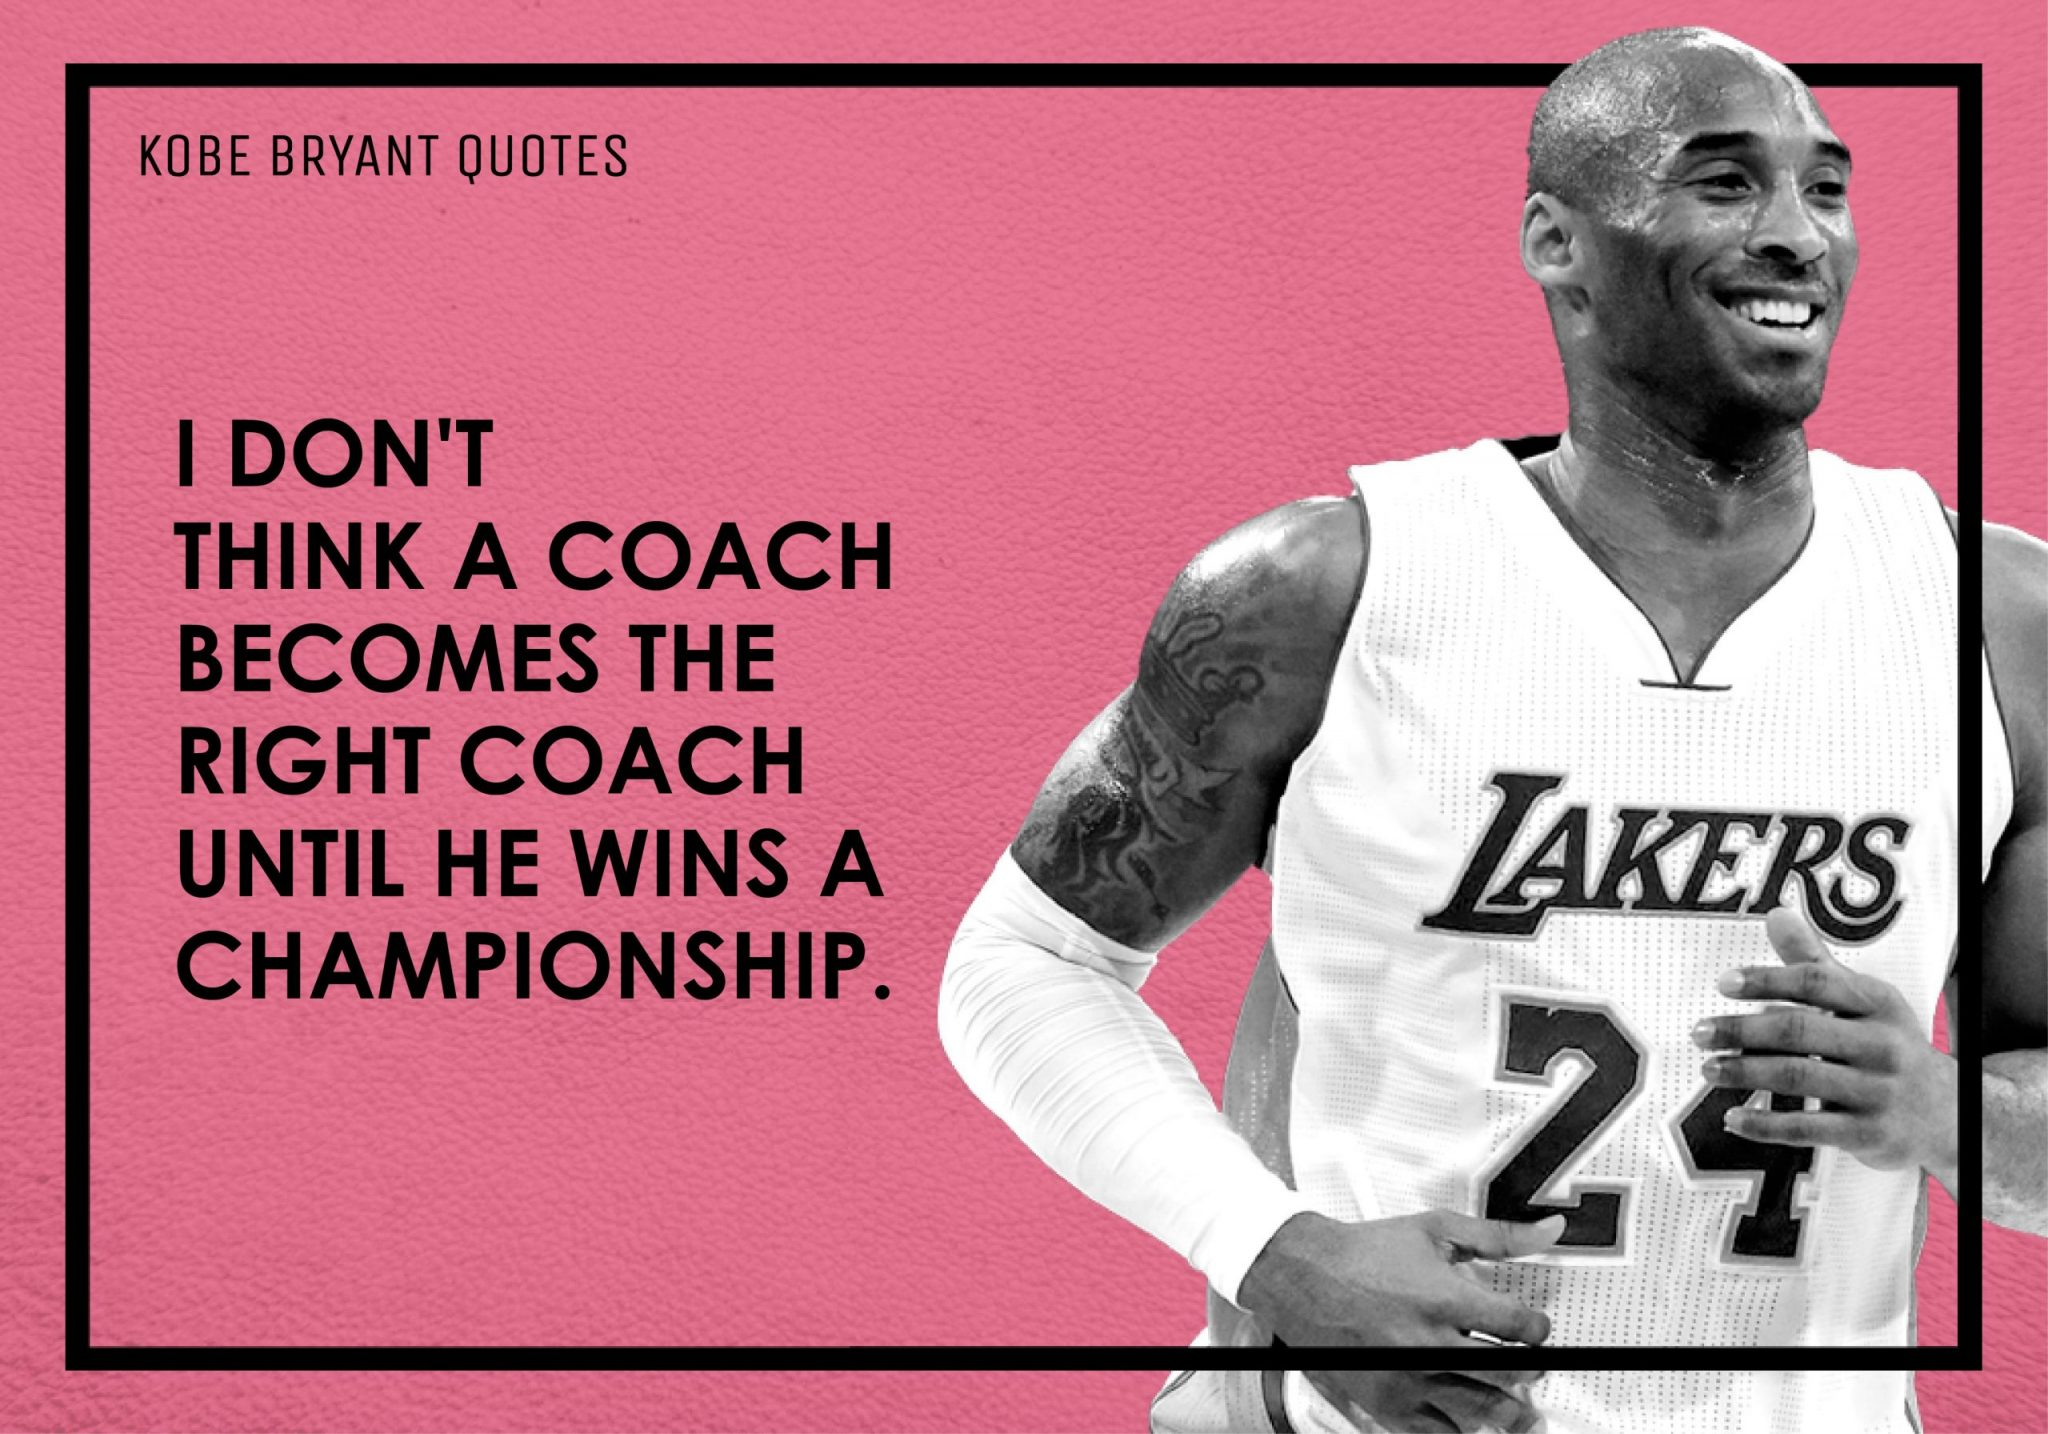 Kobe Bryant Quotes (12)